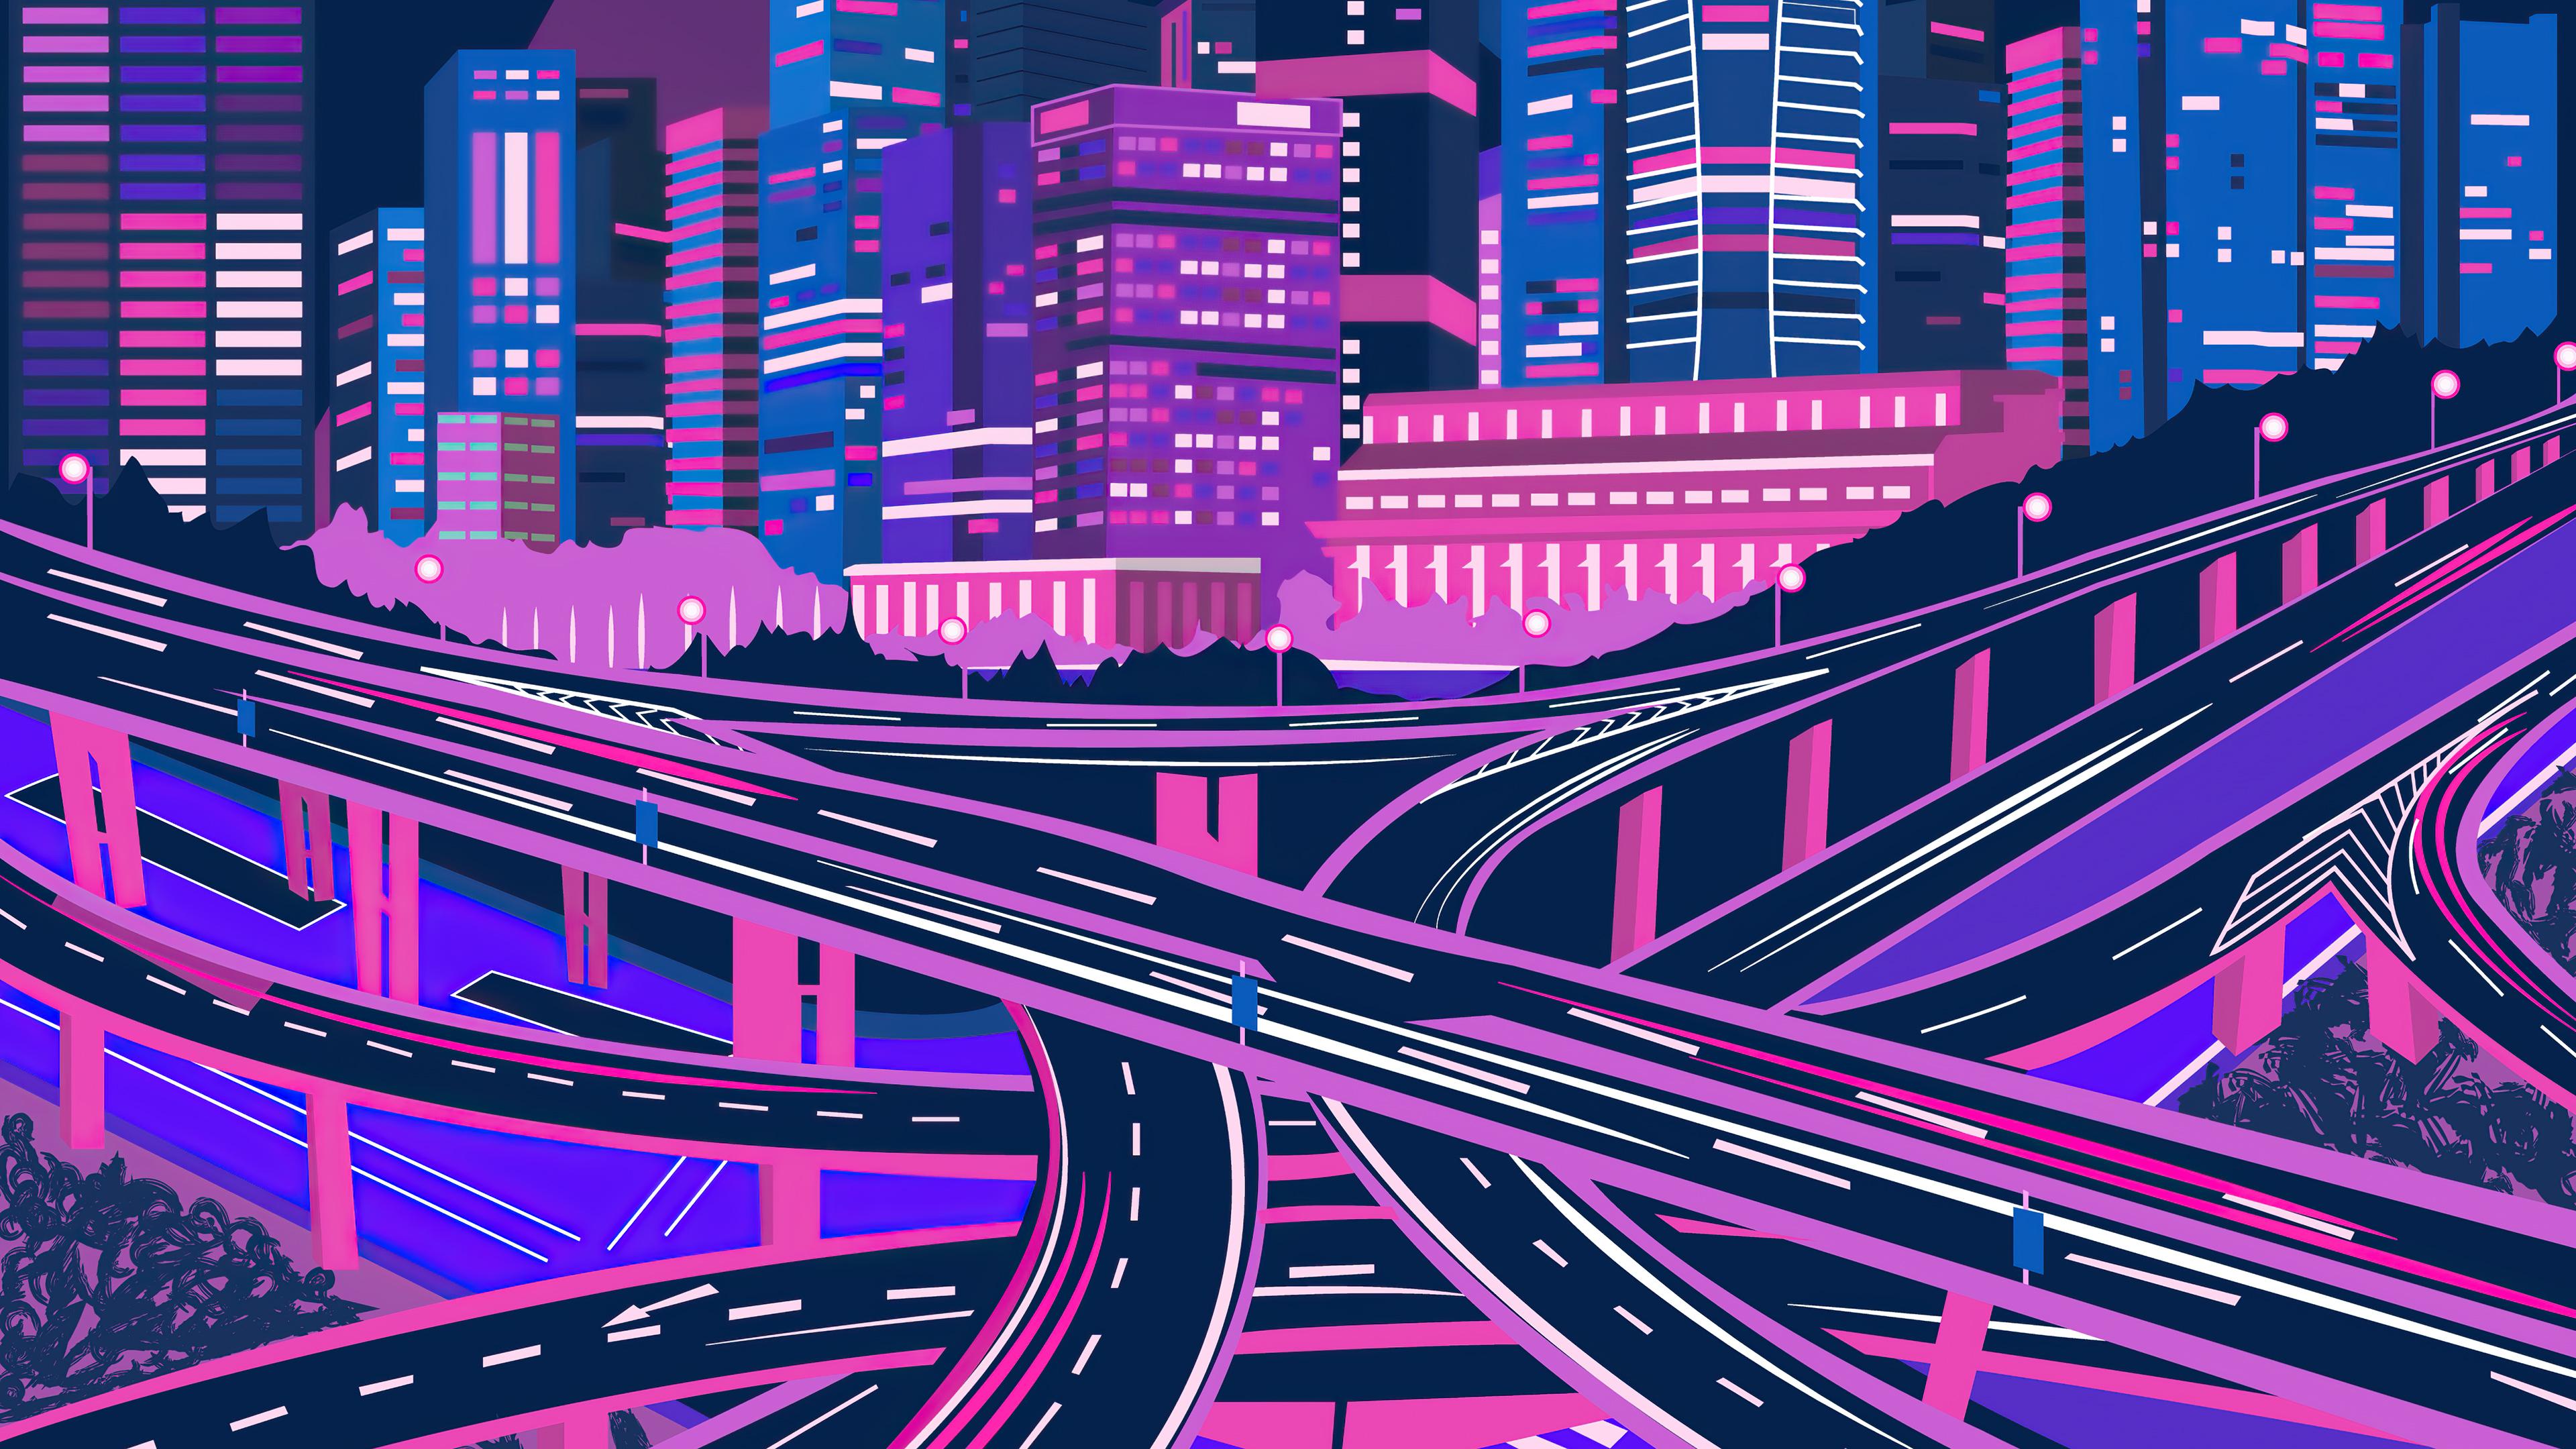 purple noen citycsape 4k 1618132157 - Purple Noen Citycsape 4k - Purple Noen Citycsape 4k wallpapers